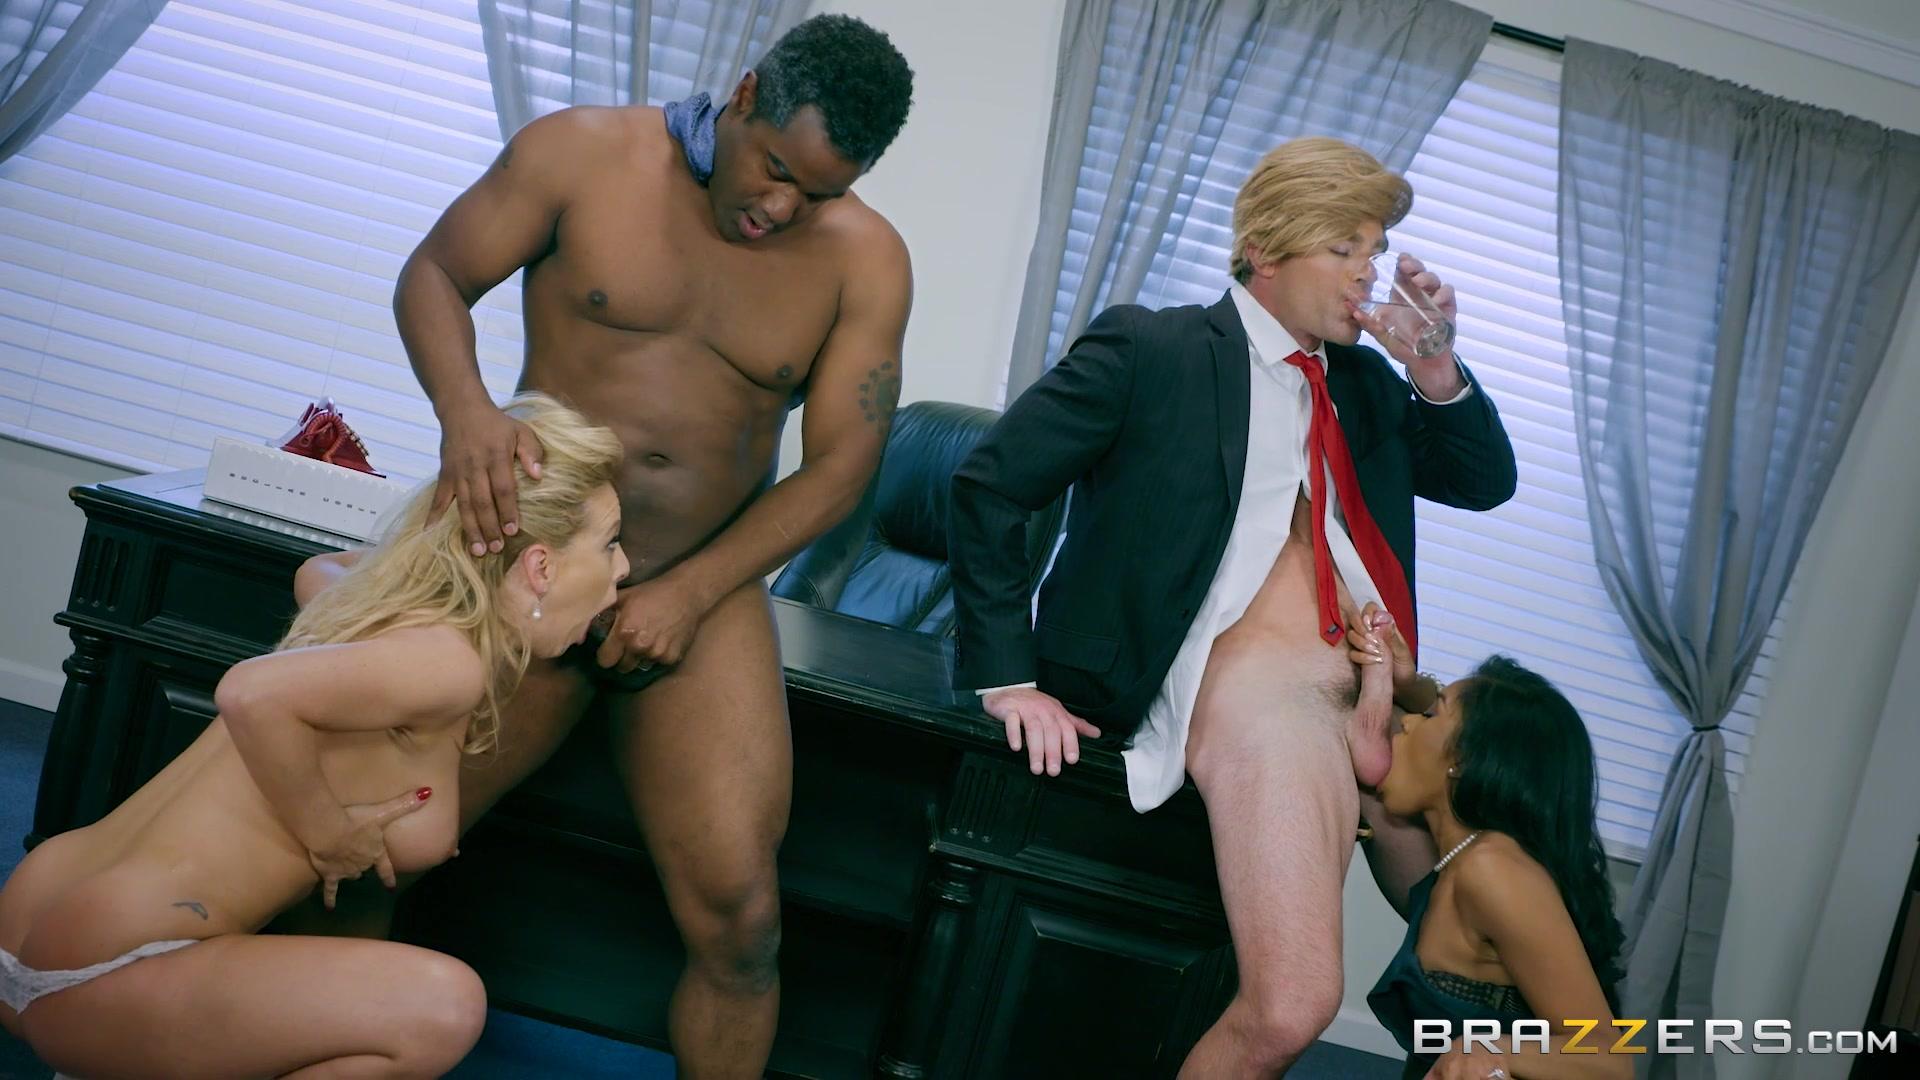 Blonde Beauty Cherie DeVille and Black Babe Yasmine DeLeon Enjoy Big Dicks on th... Starring: Cherie DeVille Yasmine DeLeon Length: 41 min